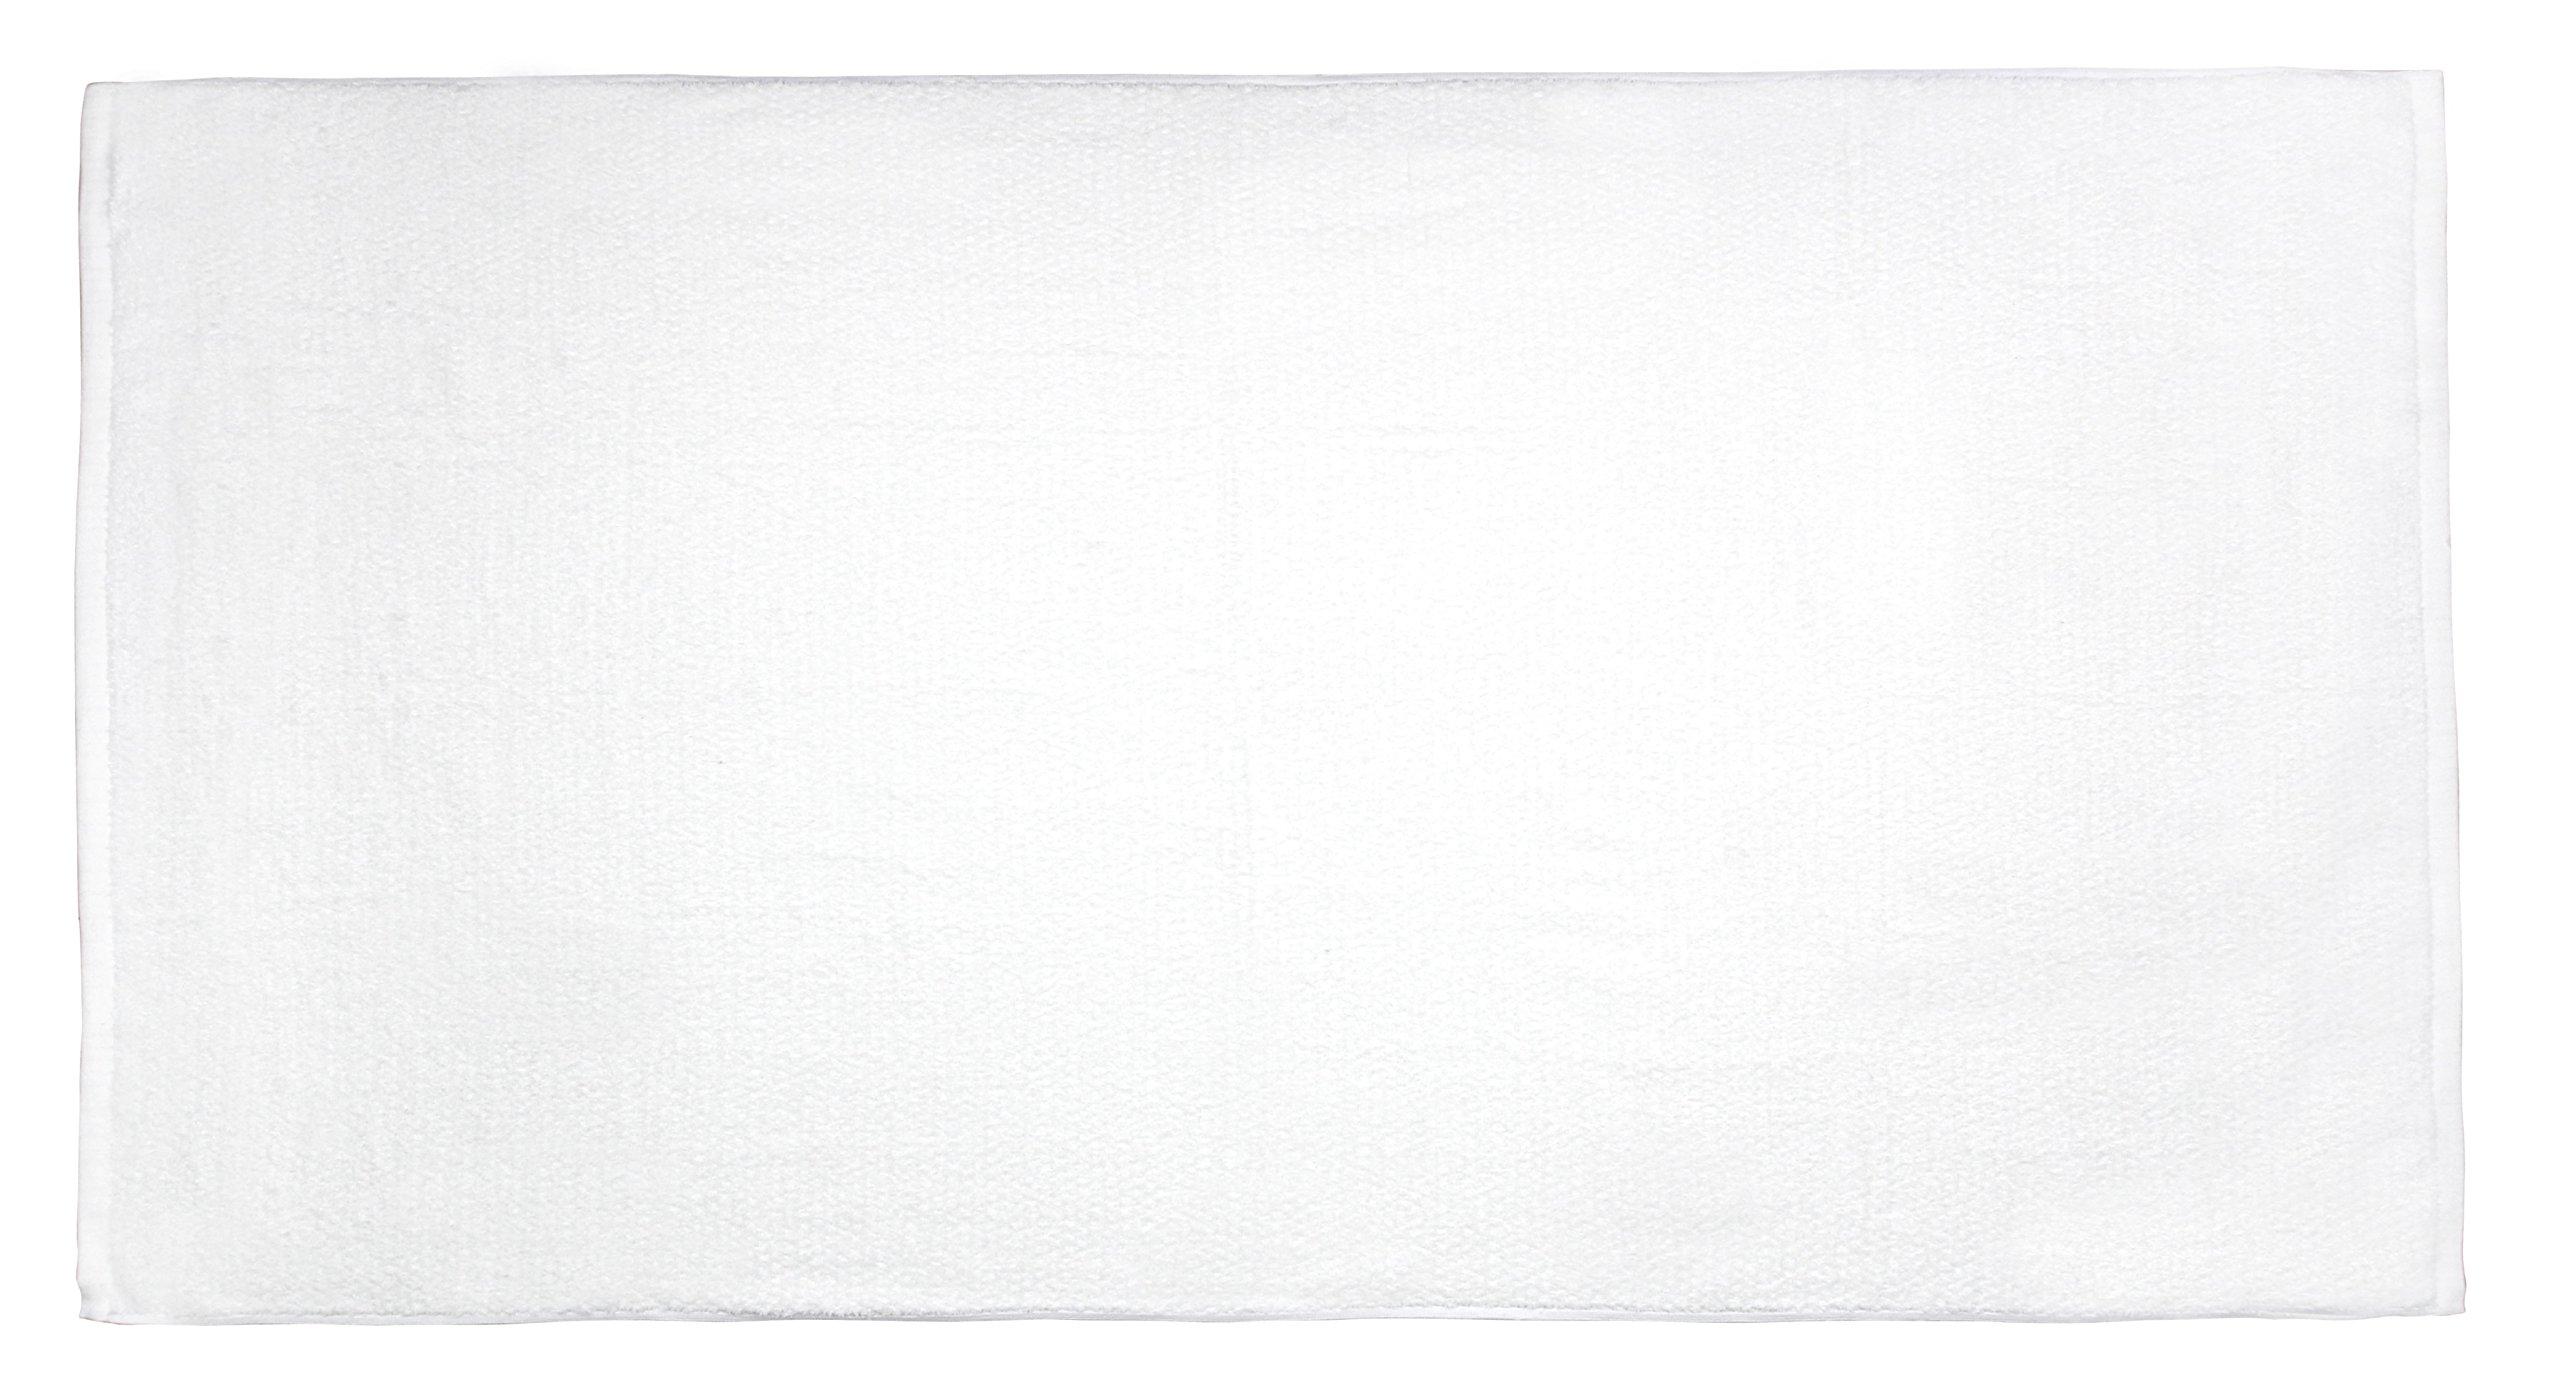 Everplush Diamond Jacquard Bath Sheet 2 Pack in White by Everplush (Image #3)